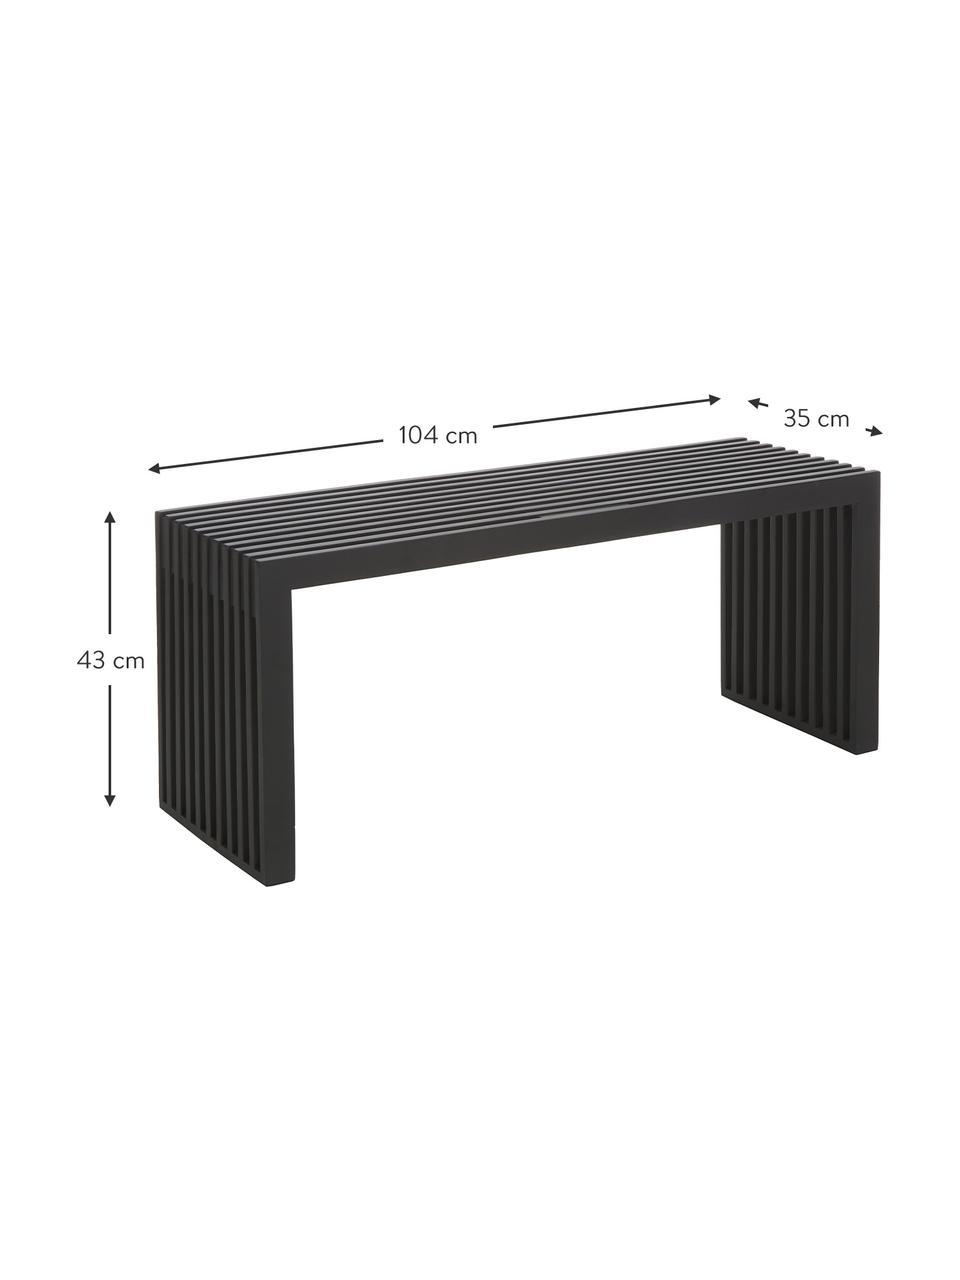 Sitzbank Bank Rib in Schwarz aus Massivholz, Mahagoniholz, lackiert, Schwarz, 104 x 43 cm